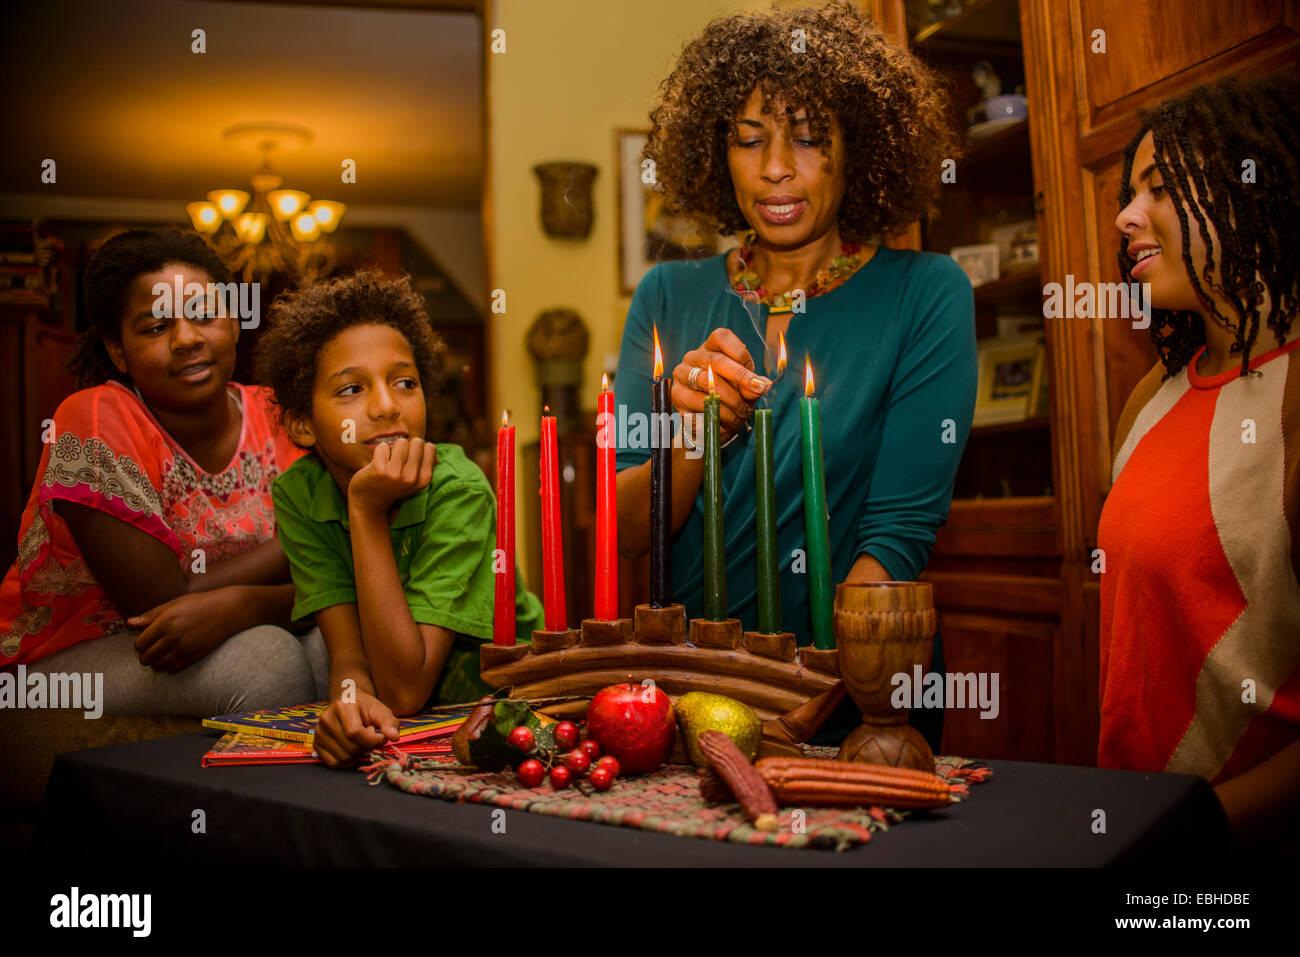 Family lighting kinara candles, celebrating Kwanzaa - Stock Image